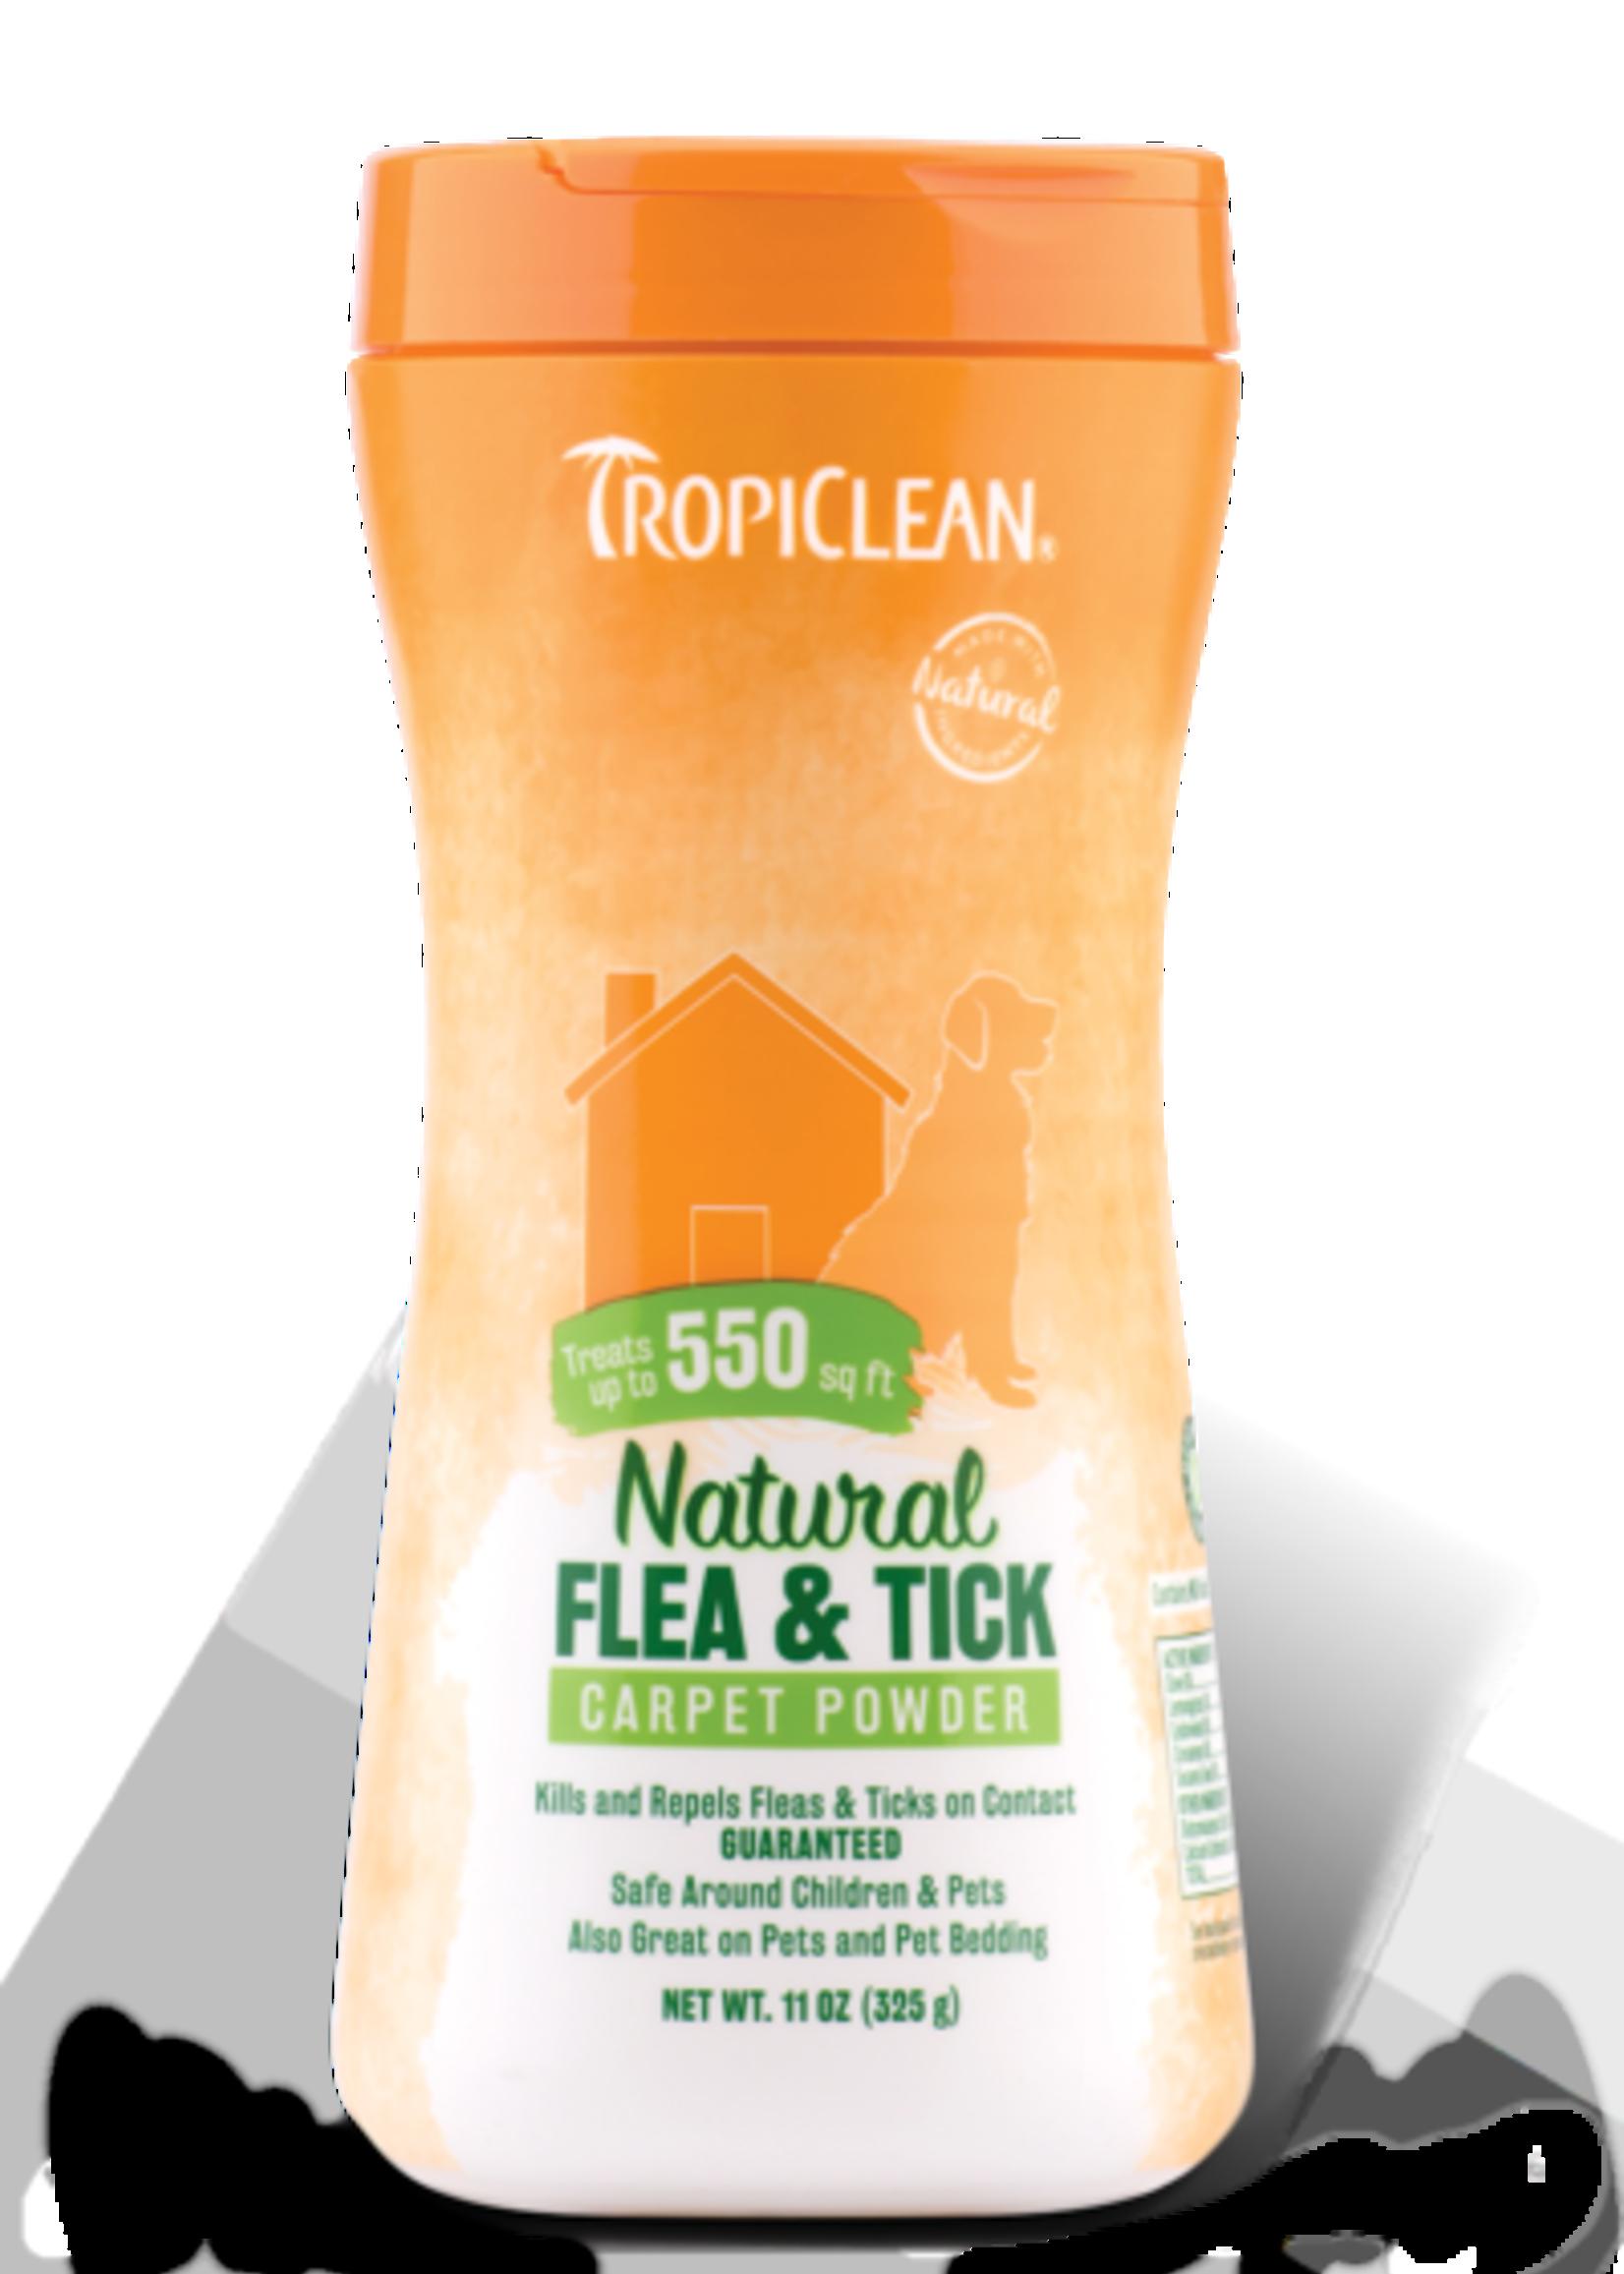 Tropiclean Manufacturing TropiClean Home Flea and Tick Carpet Powder 11 oz